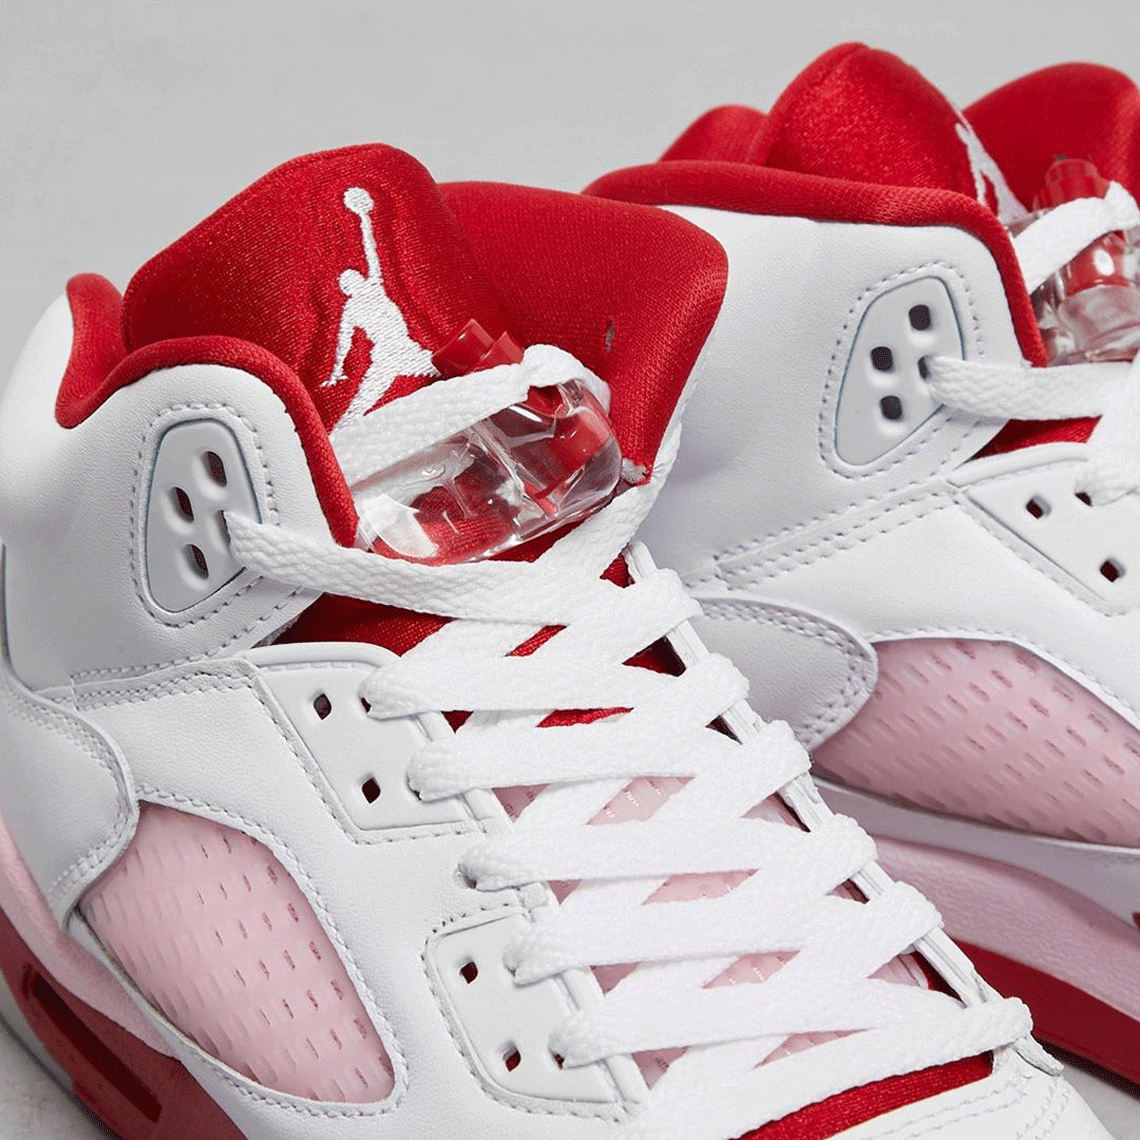 Air Jordan 5 Kids White Pink Foam 440892-106   SneakerNews.com